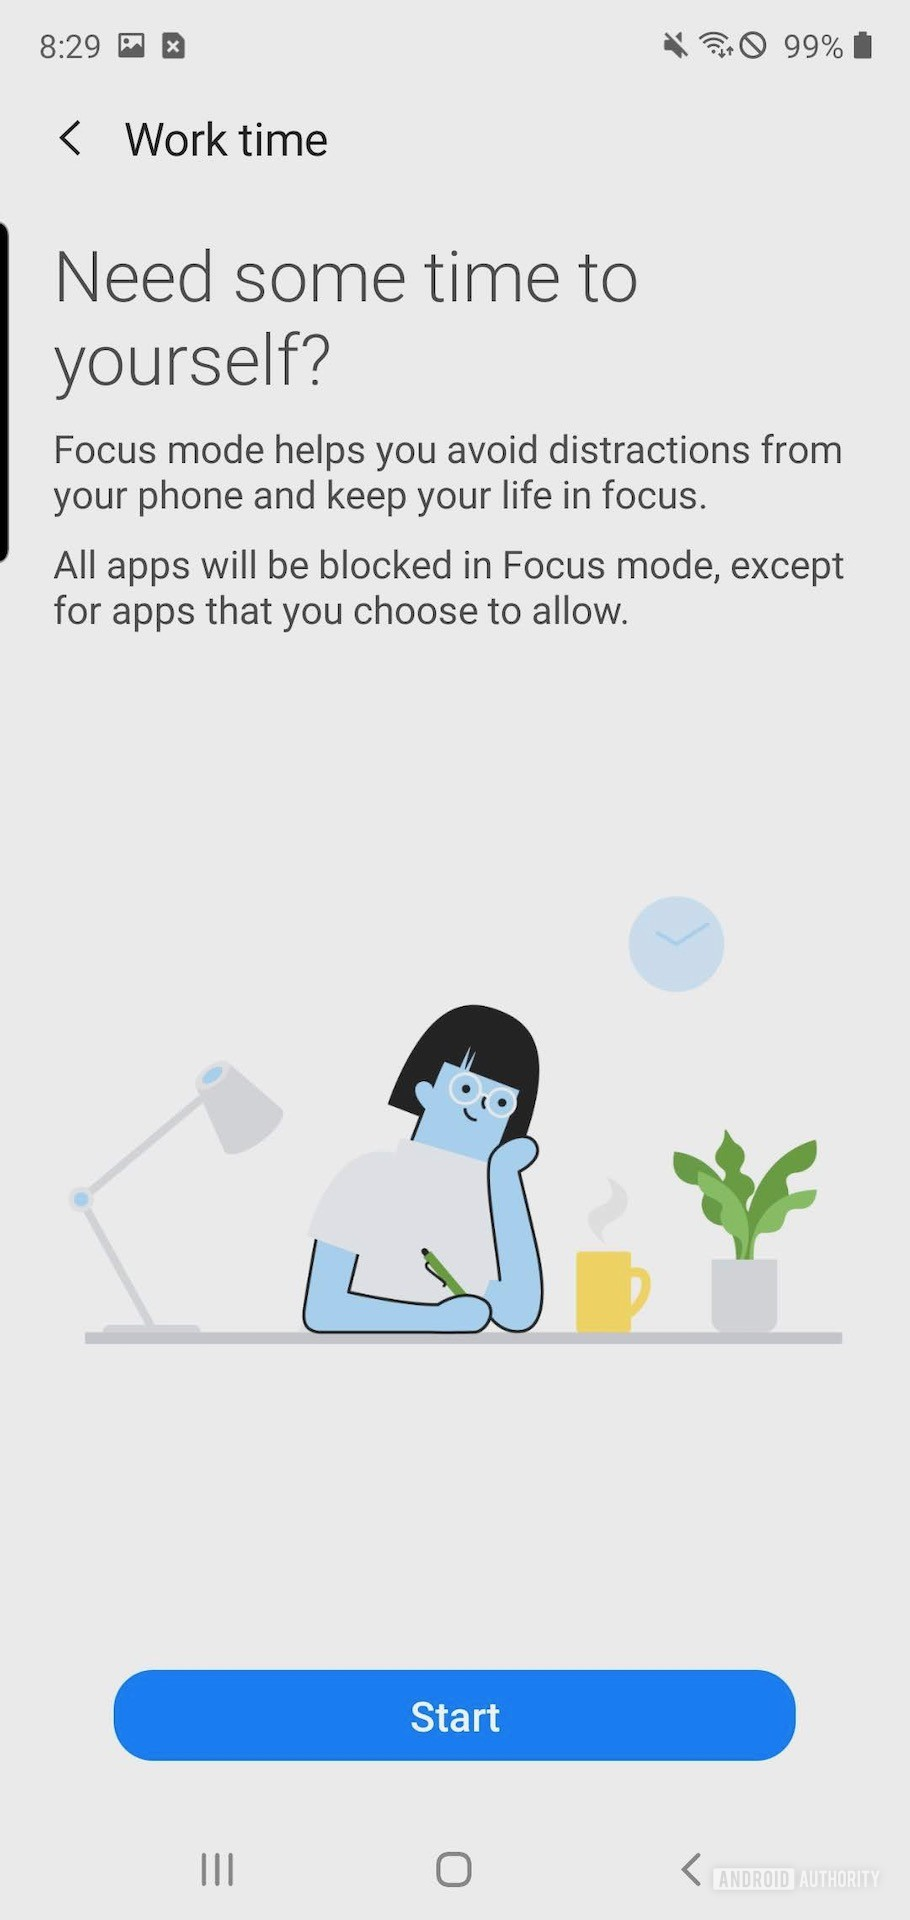 Samsung One UI 2 digital wellbeing work time